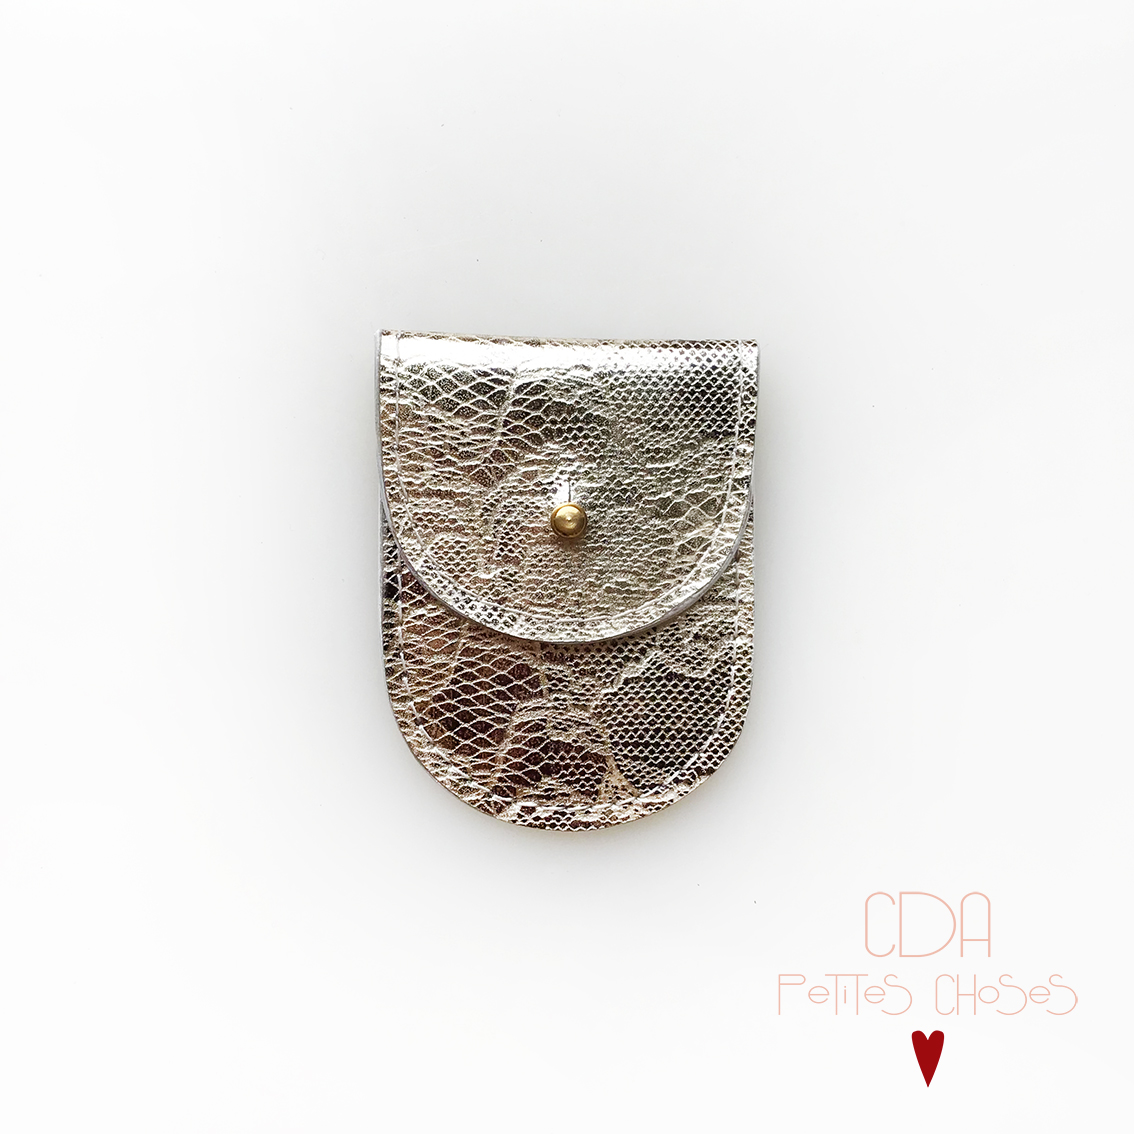 mini-pochette-en-cuir-embosse-dentelle-1 CDA Petites Choses